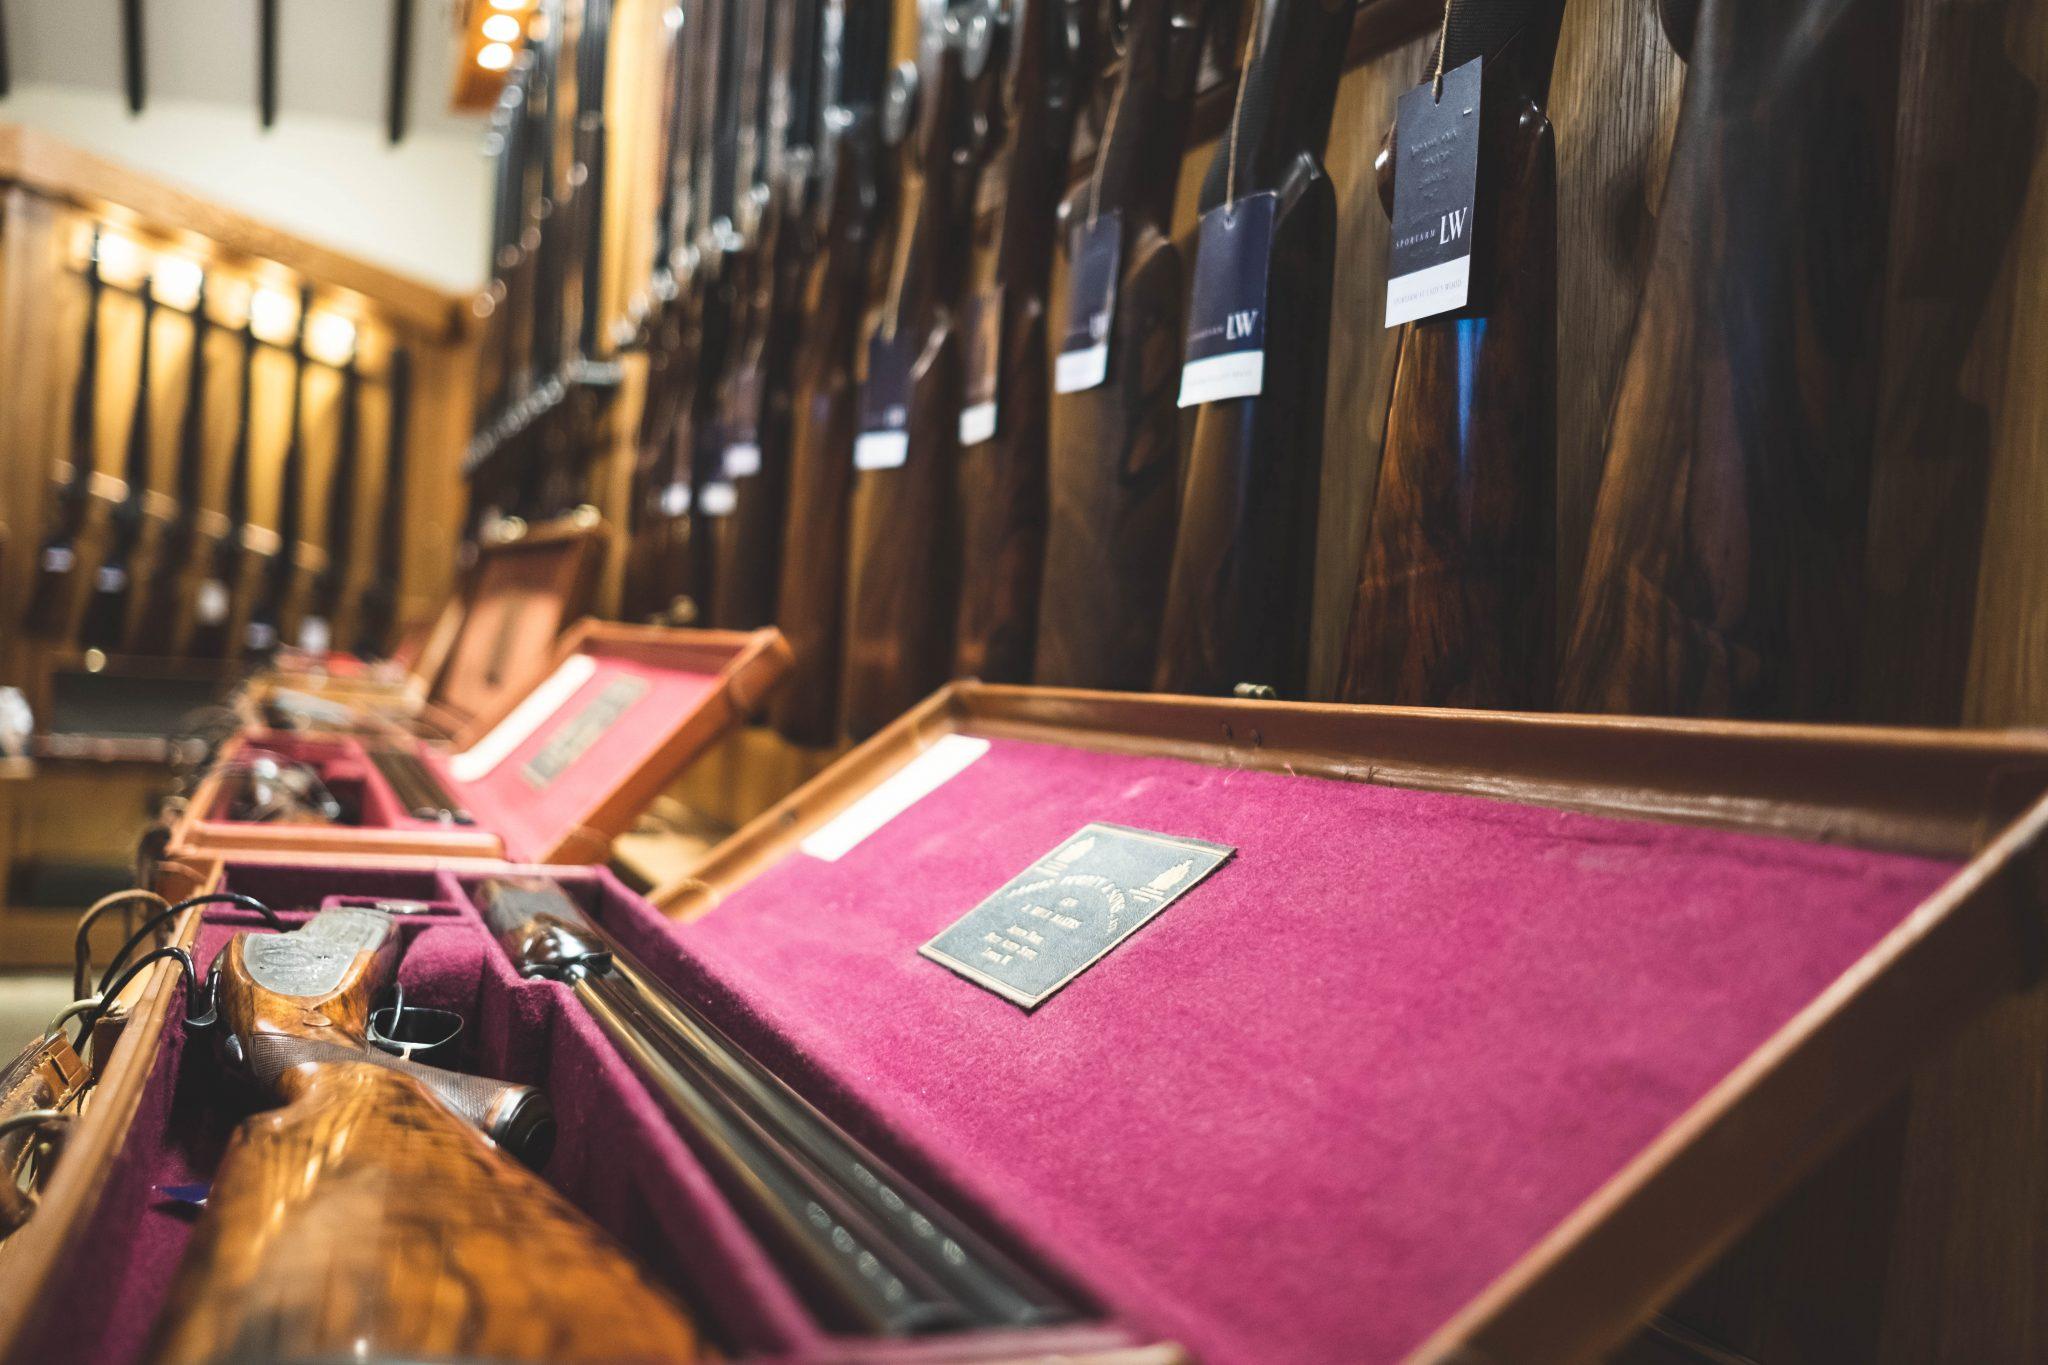 Guns showcased within Sportarm at Lady's Wood gunroom